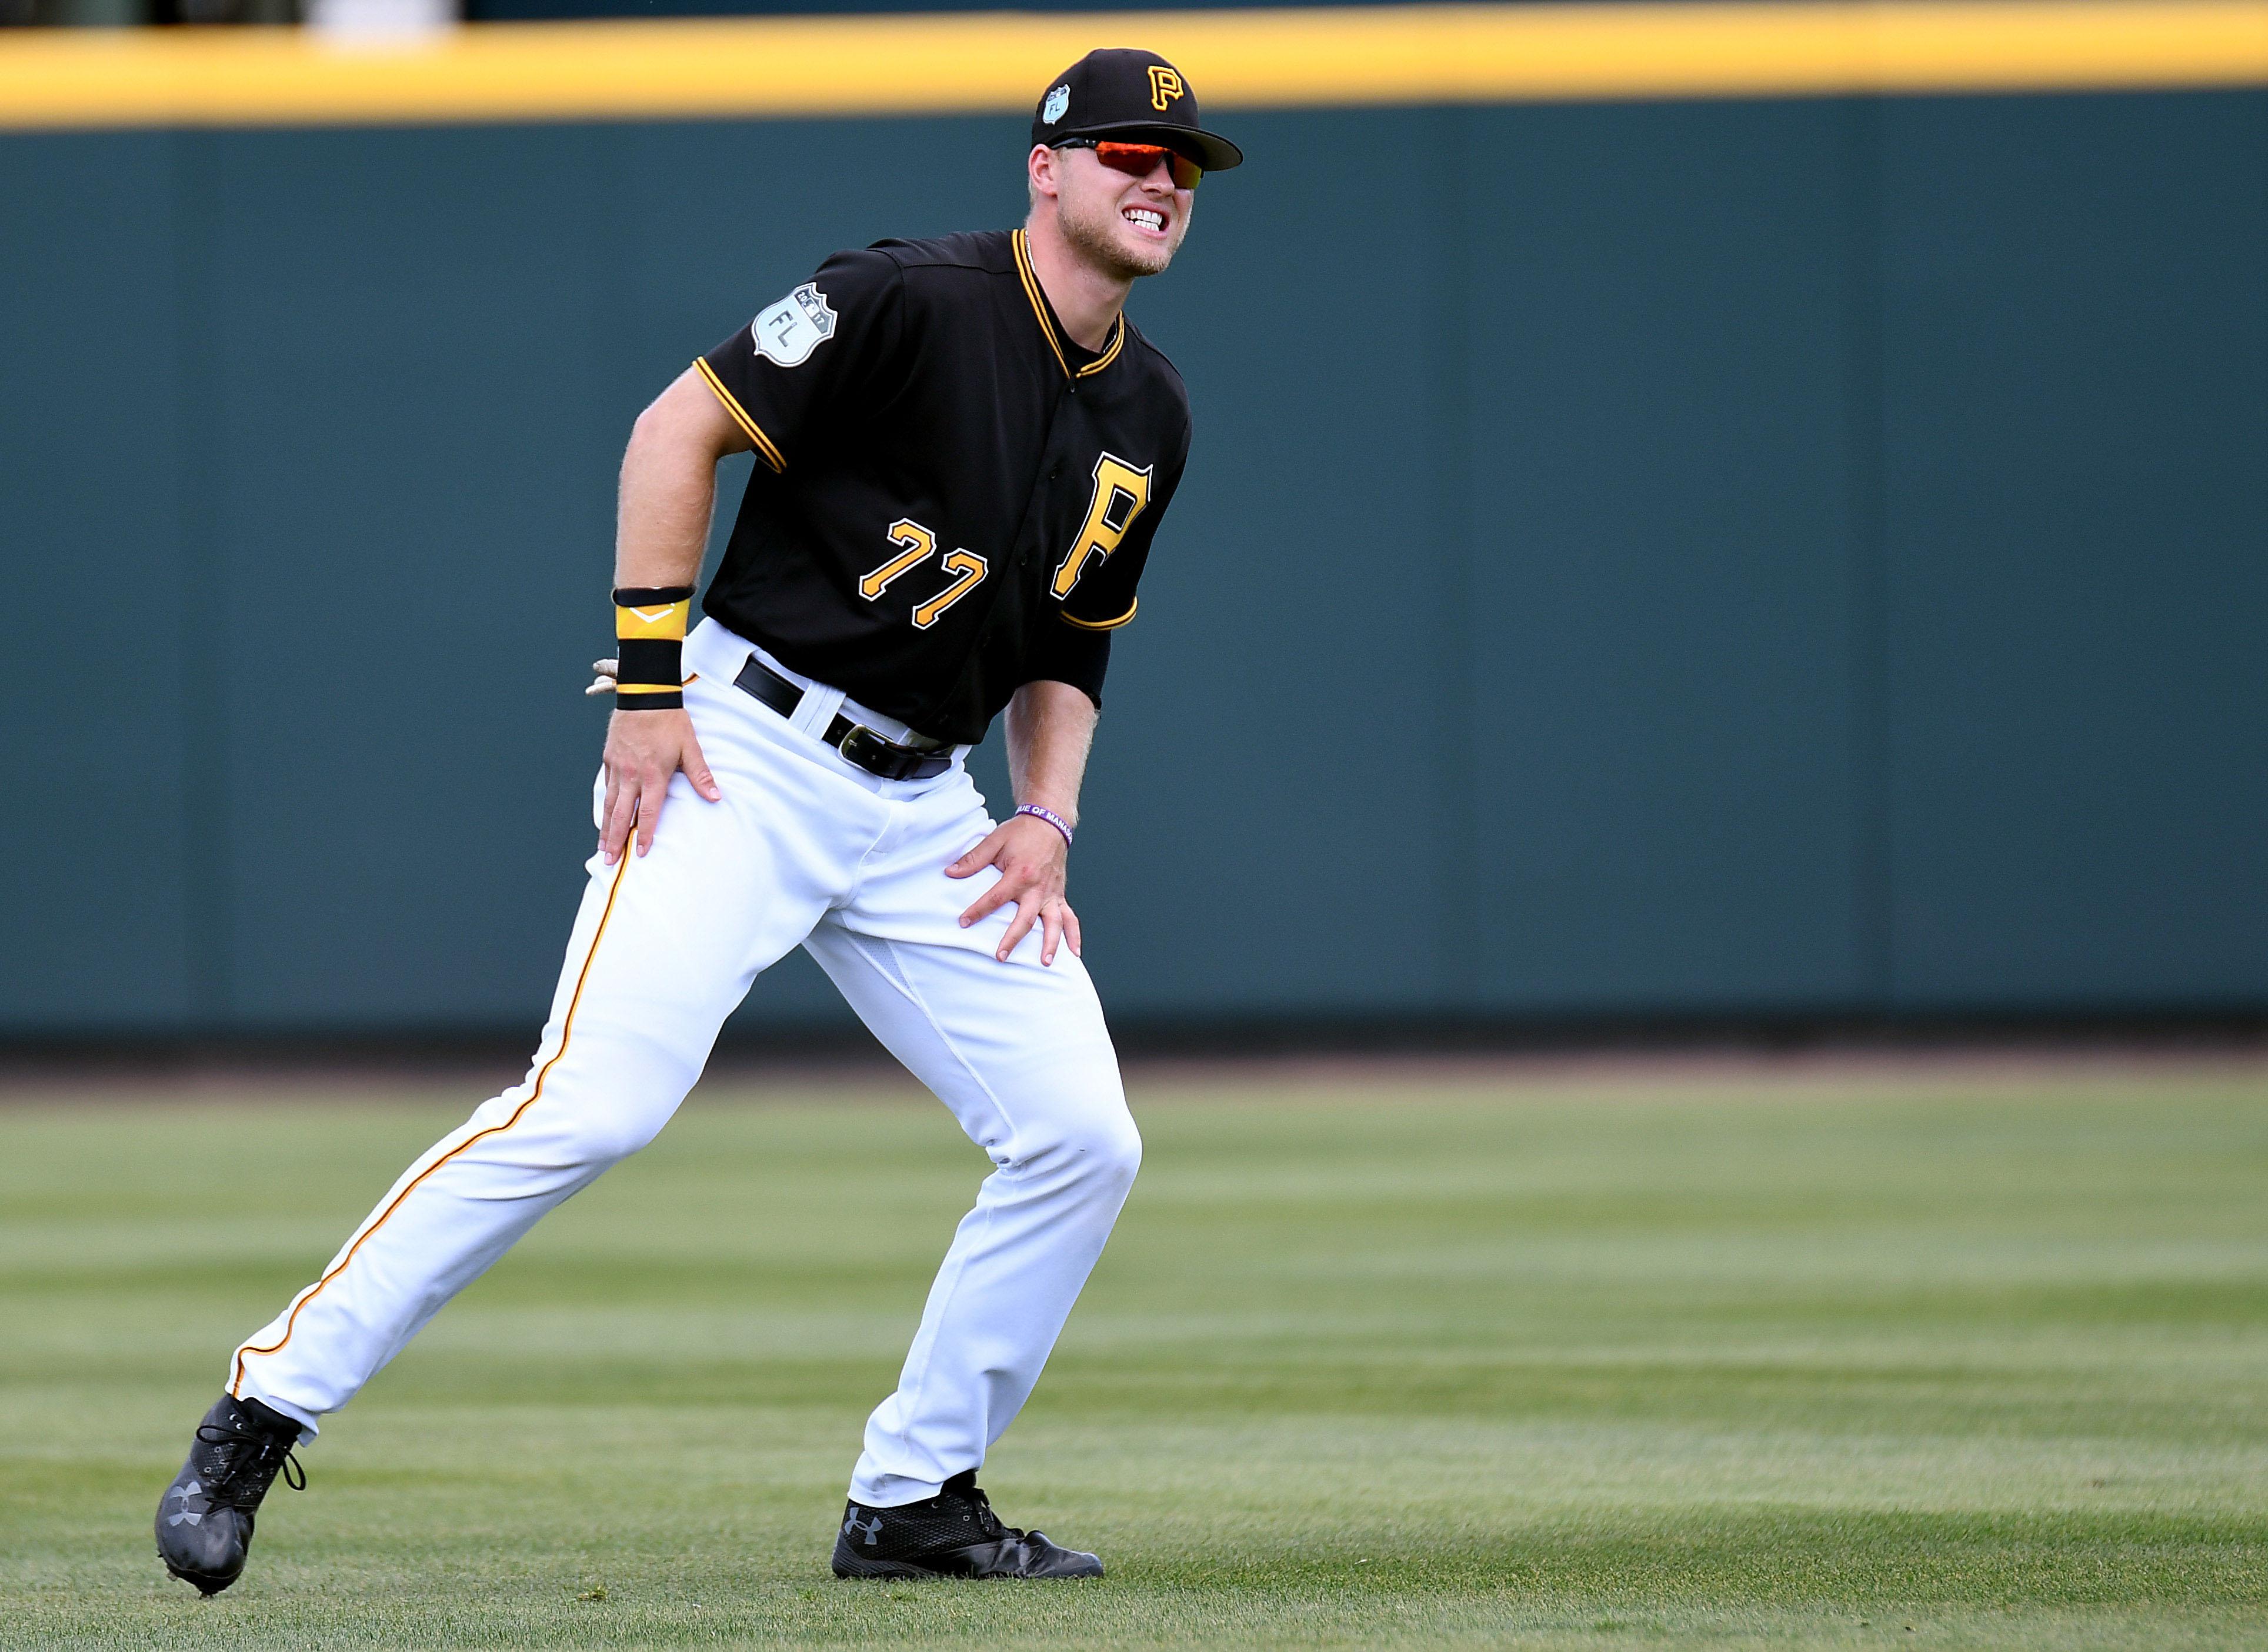 Pittsburgh Pirates Wake Up Call: A new era?